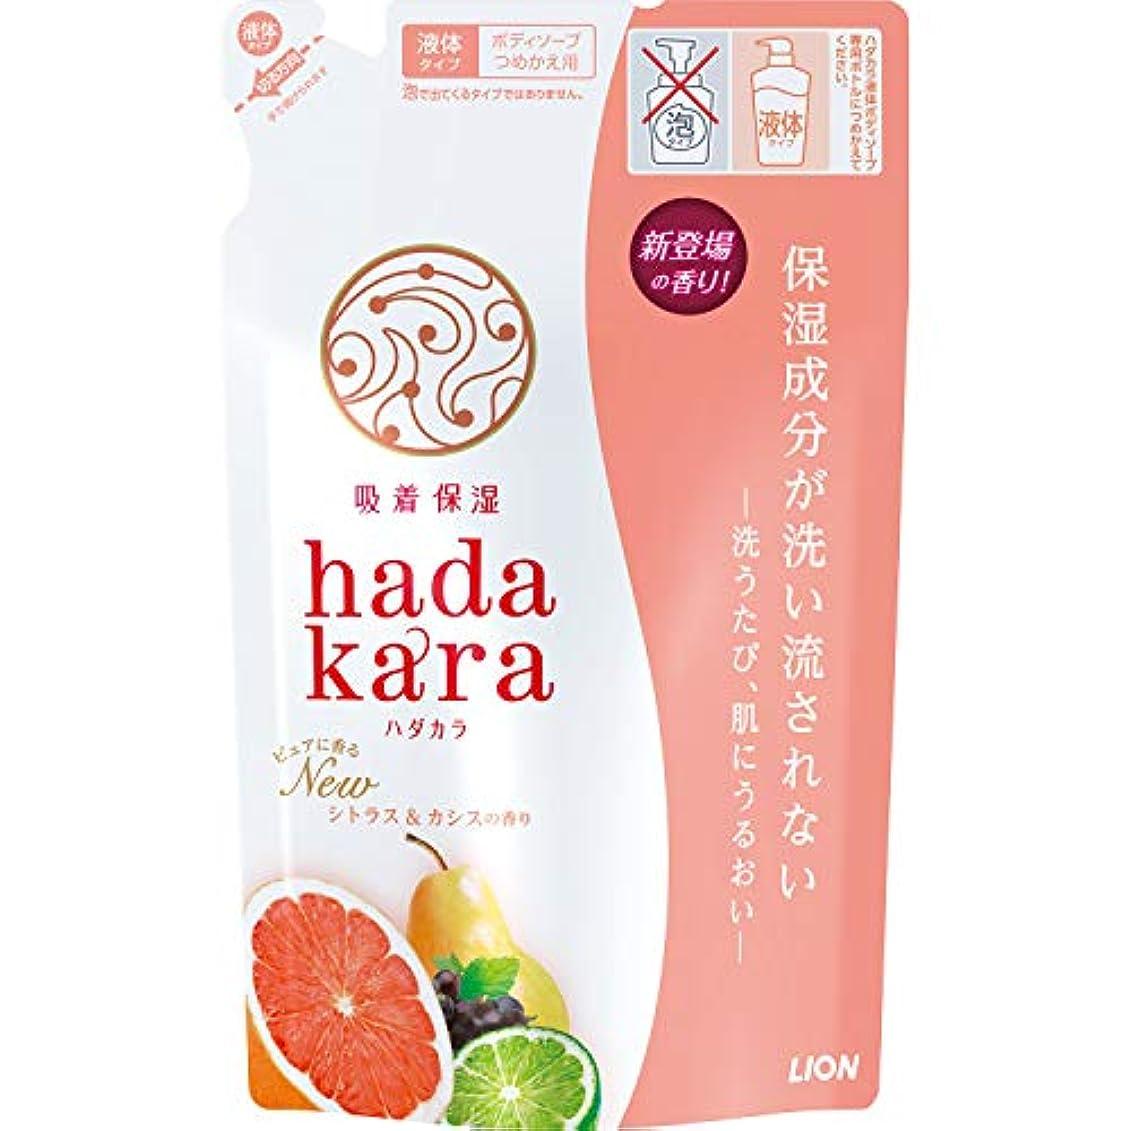 hadakara(ハダカラ) ボディソープ シトラス&カシスの香り つめかえ 360ml 詰替え用